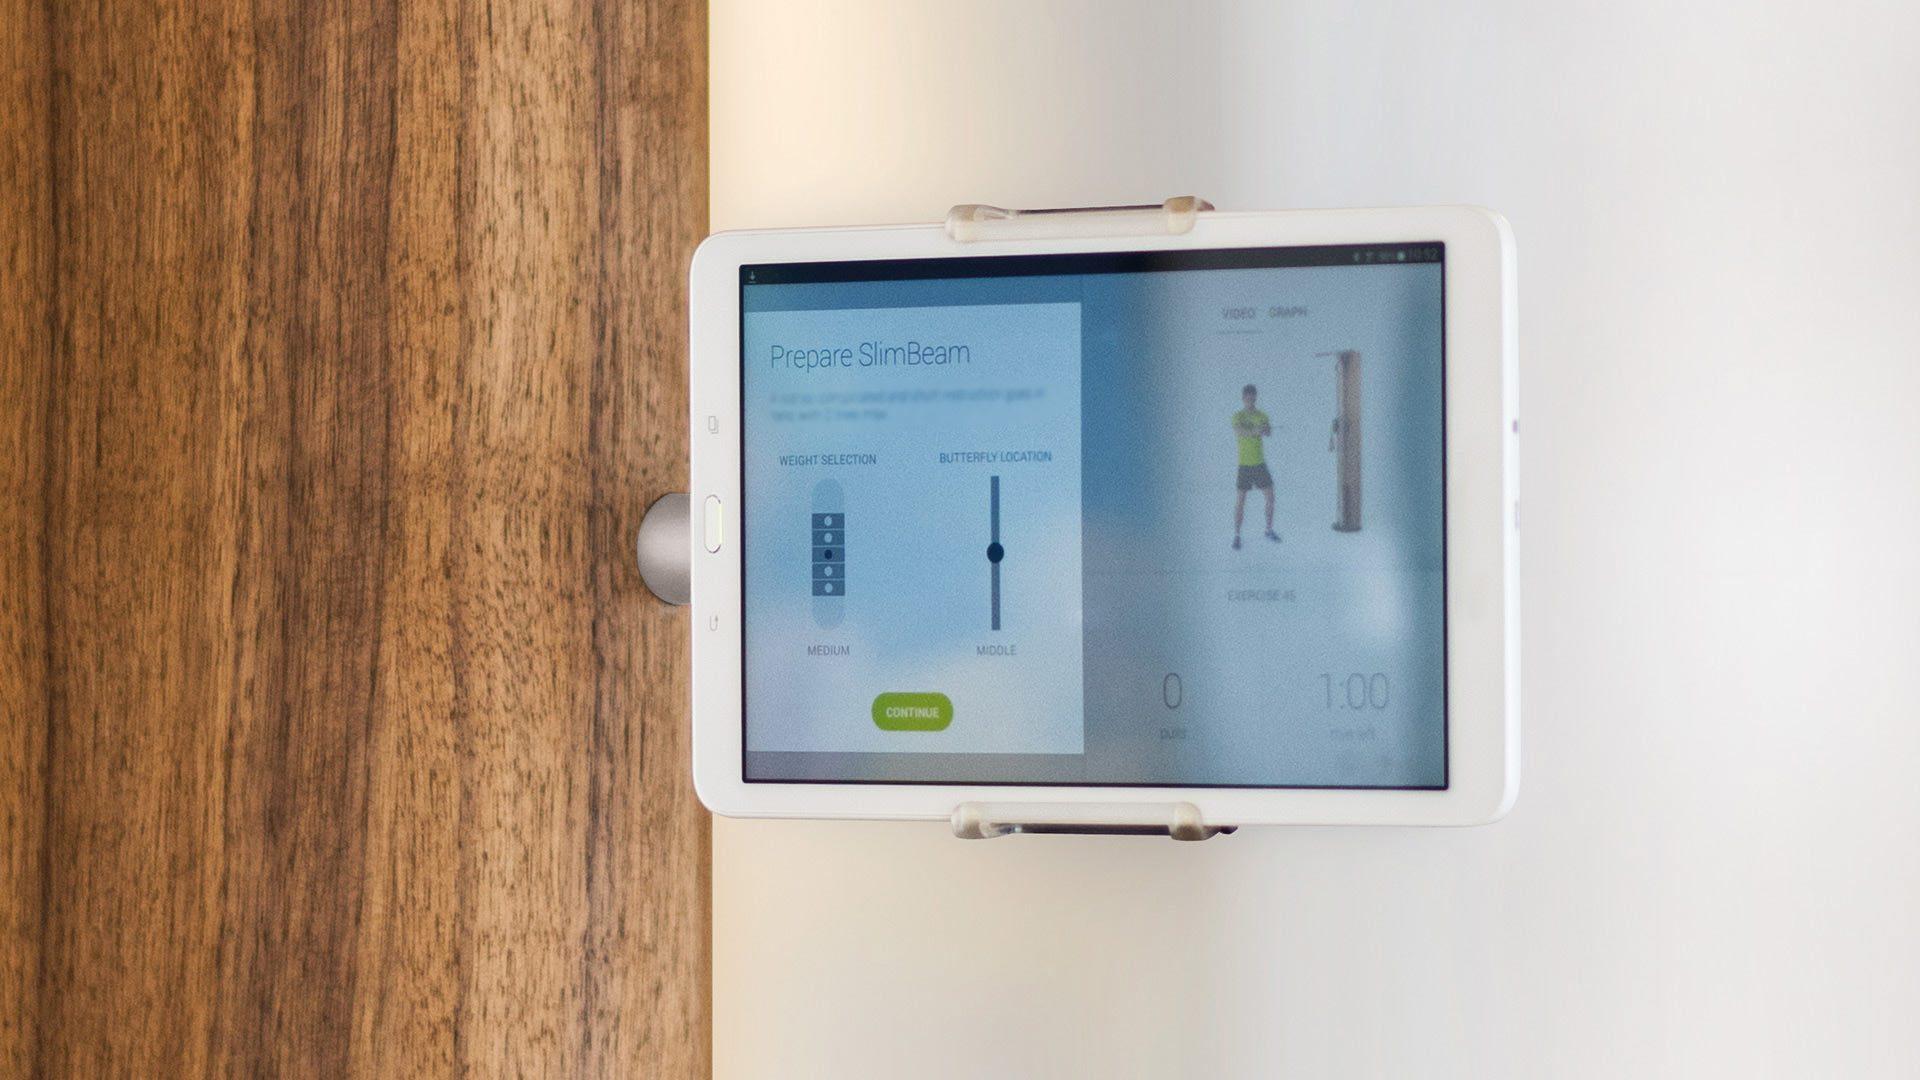 nohrd-slimbeam-app